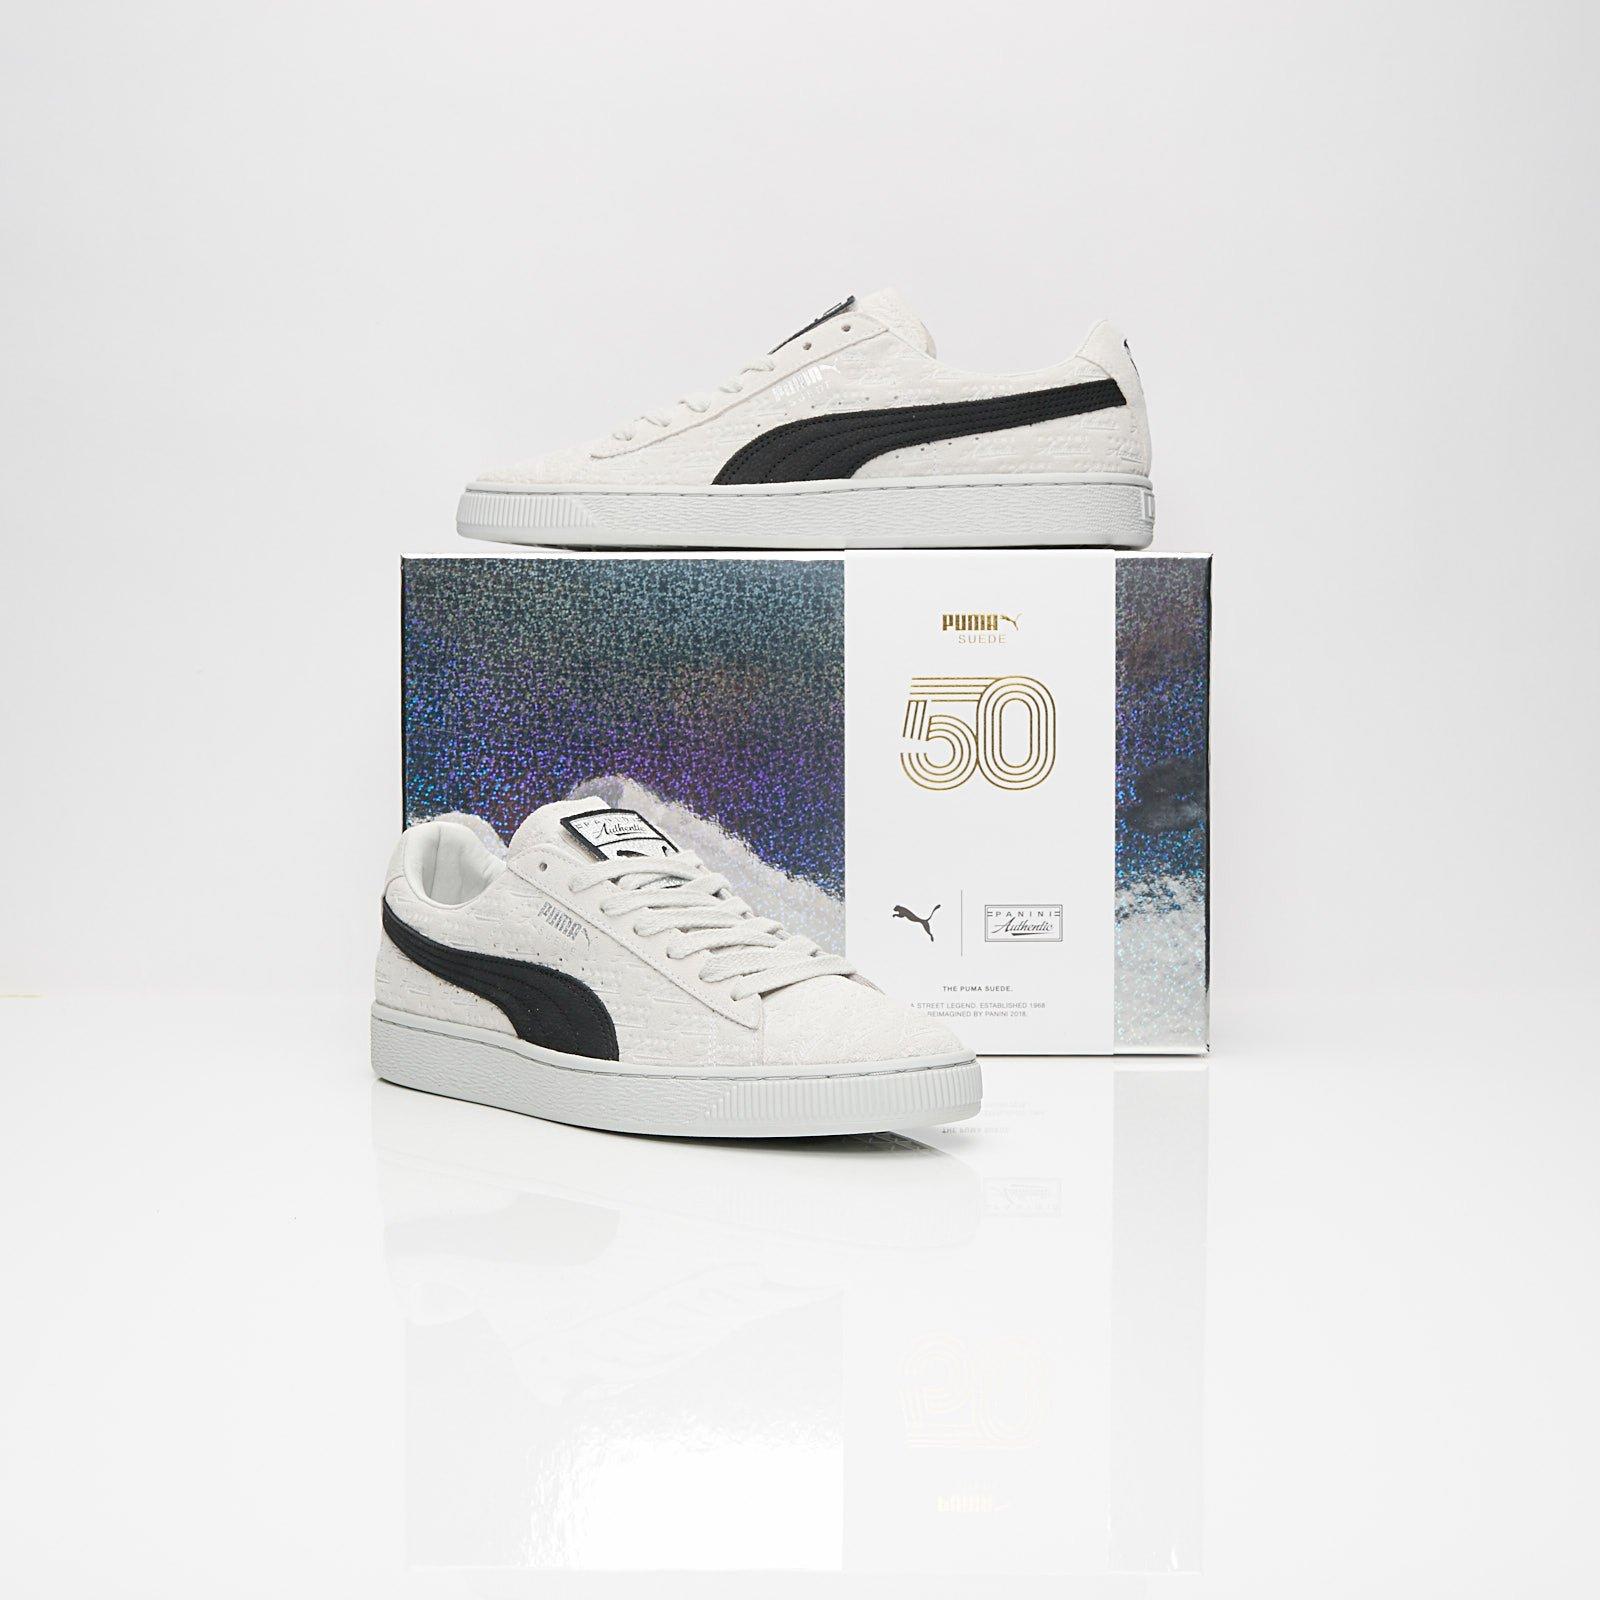 f3c3b0818c5 Puma Suede Classic X Panini - 366323-01 - Sneakersnstuff | sneakers ...